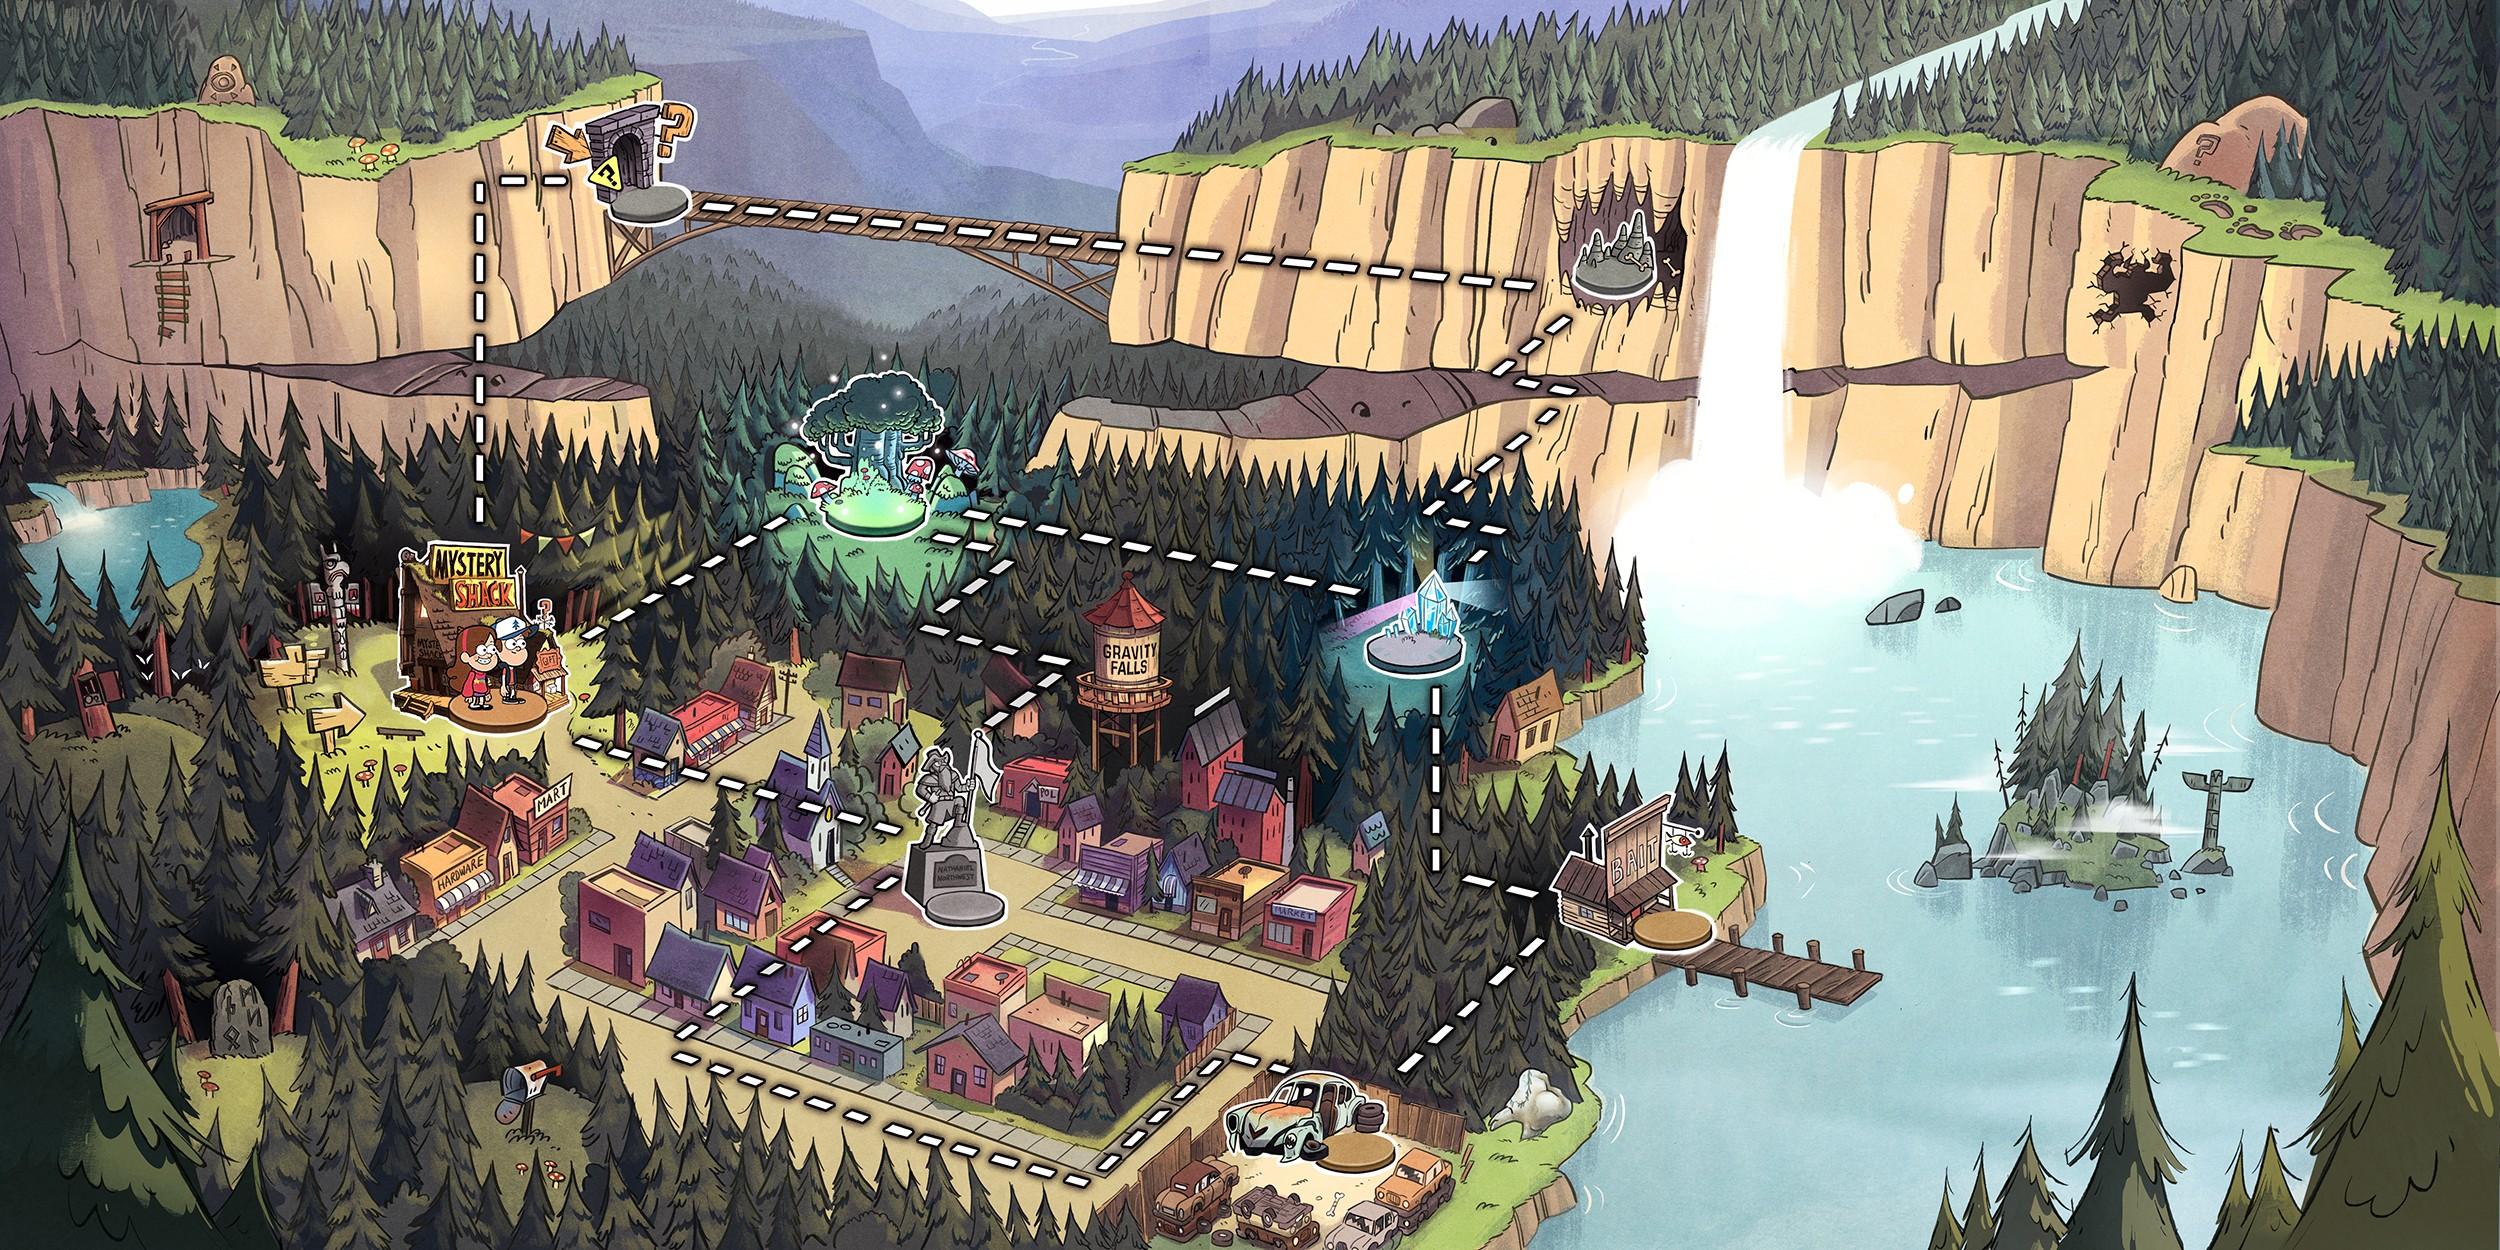 Cool Gravity Falls Wallpapers Gravity Falls Wallpaper 183 ① Download Free Cool Wallpapers